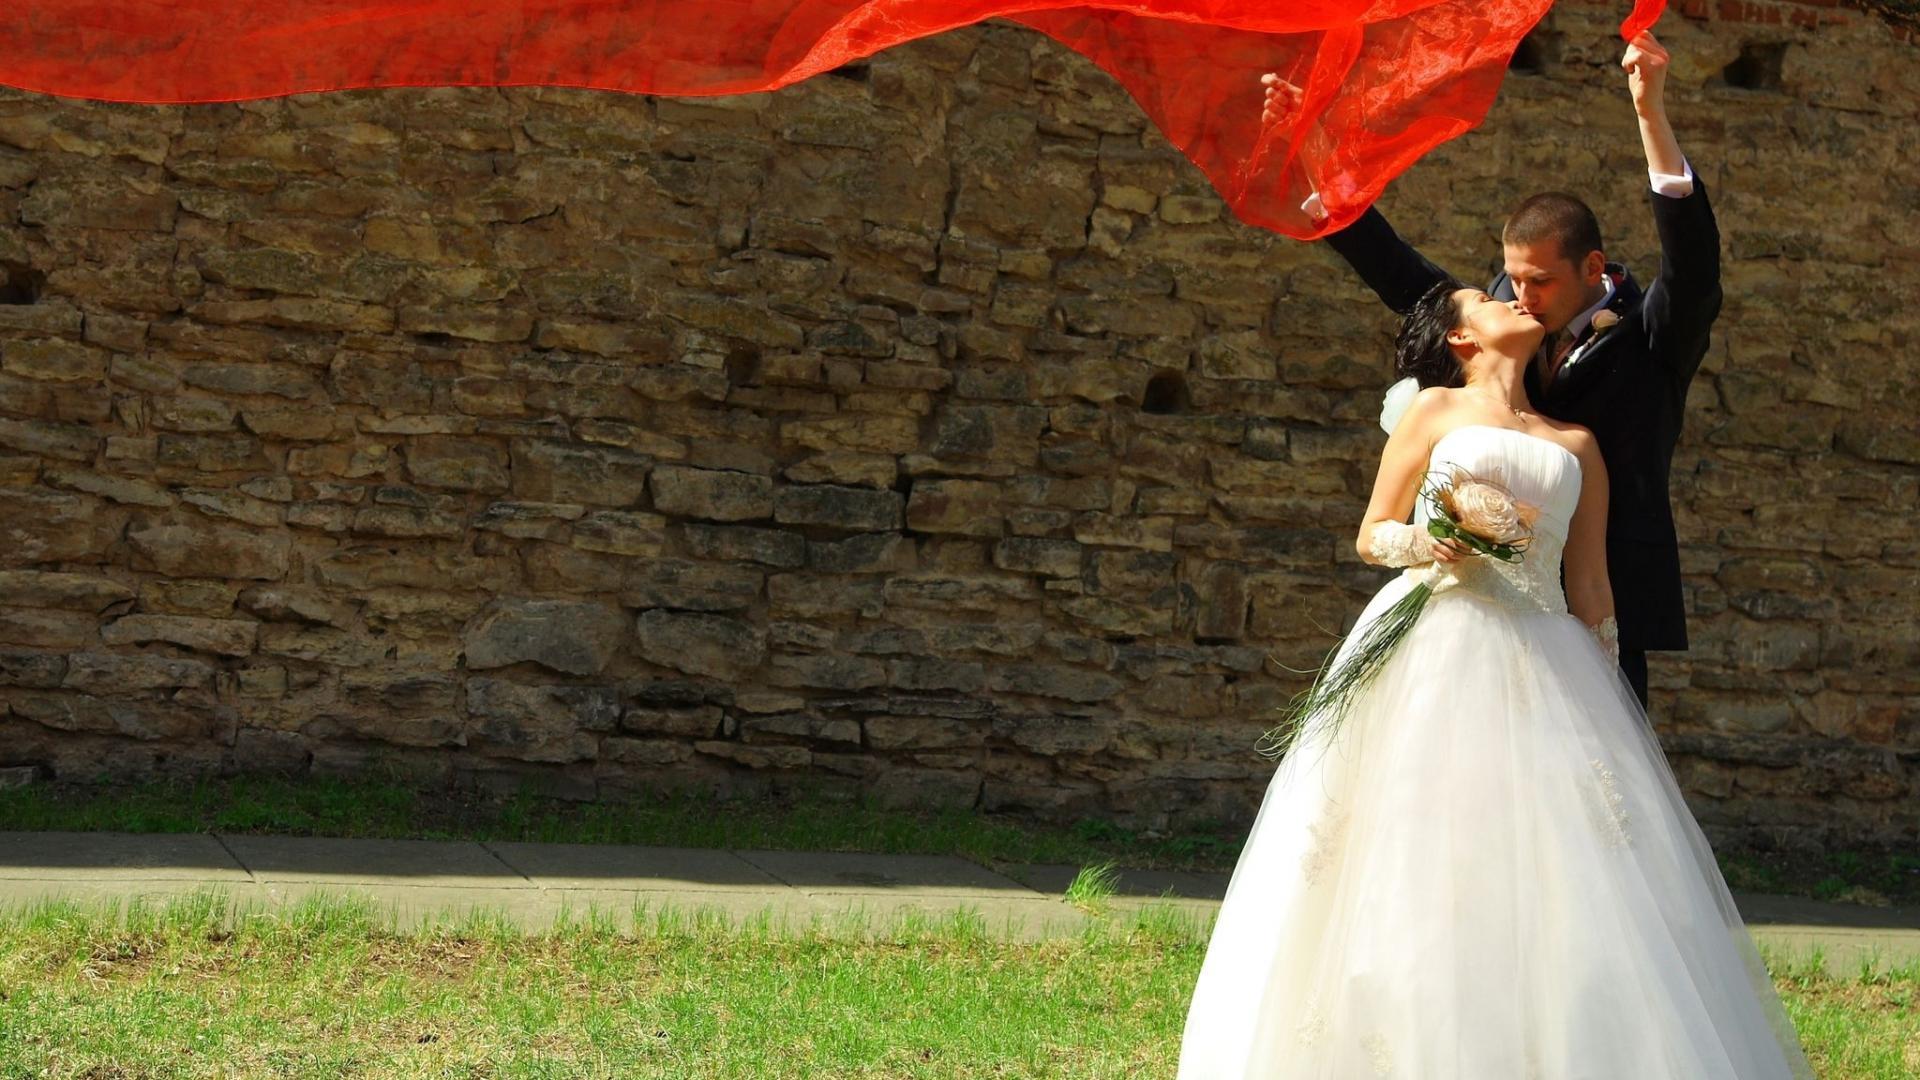 Vintage Wedding HD Wallpaper of Wedding   hdwallpaper2013com 1920x1080